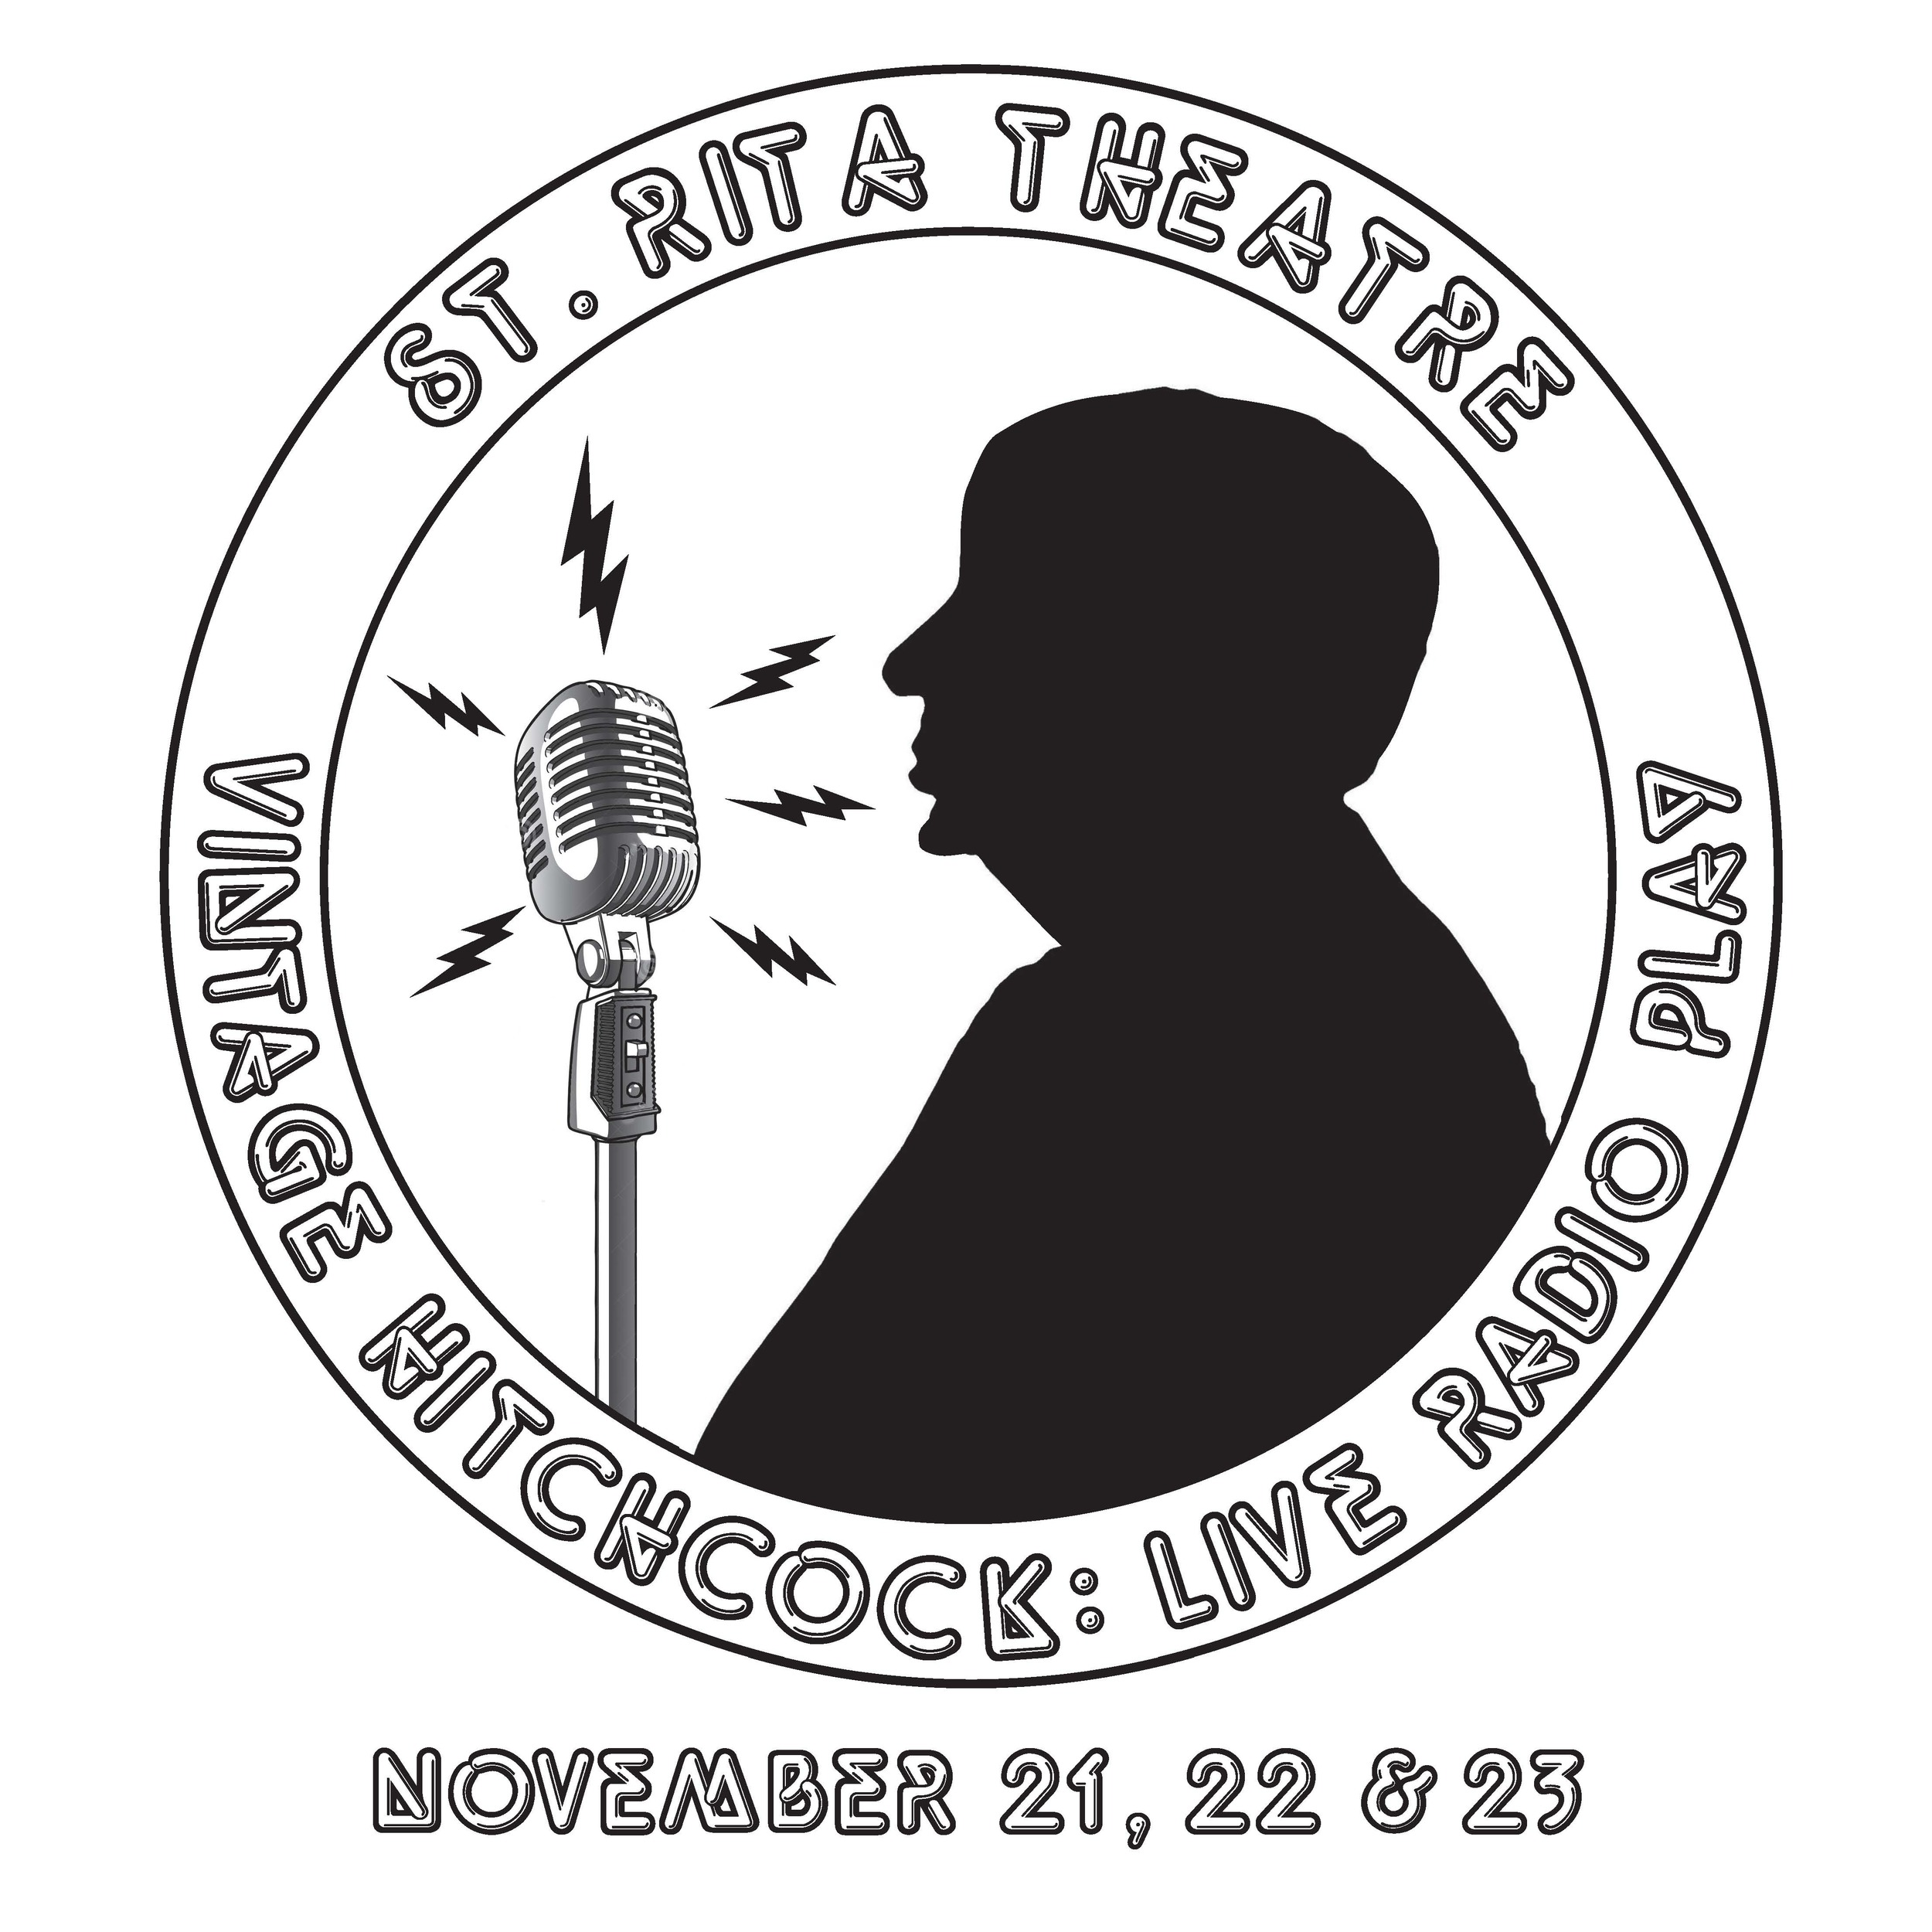 HITCHCOCK T-SHIRT ART_BACK